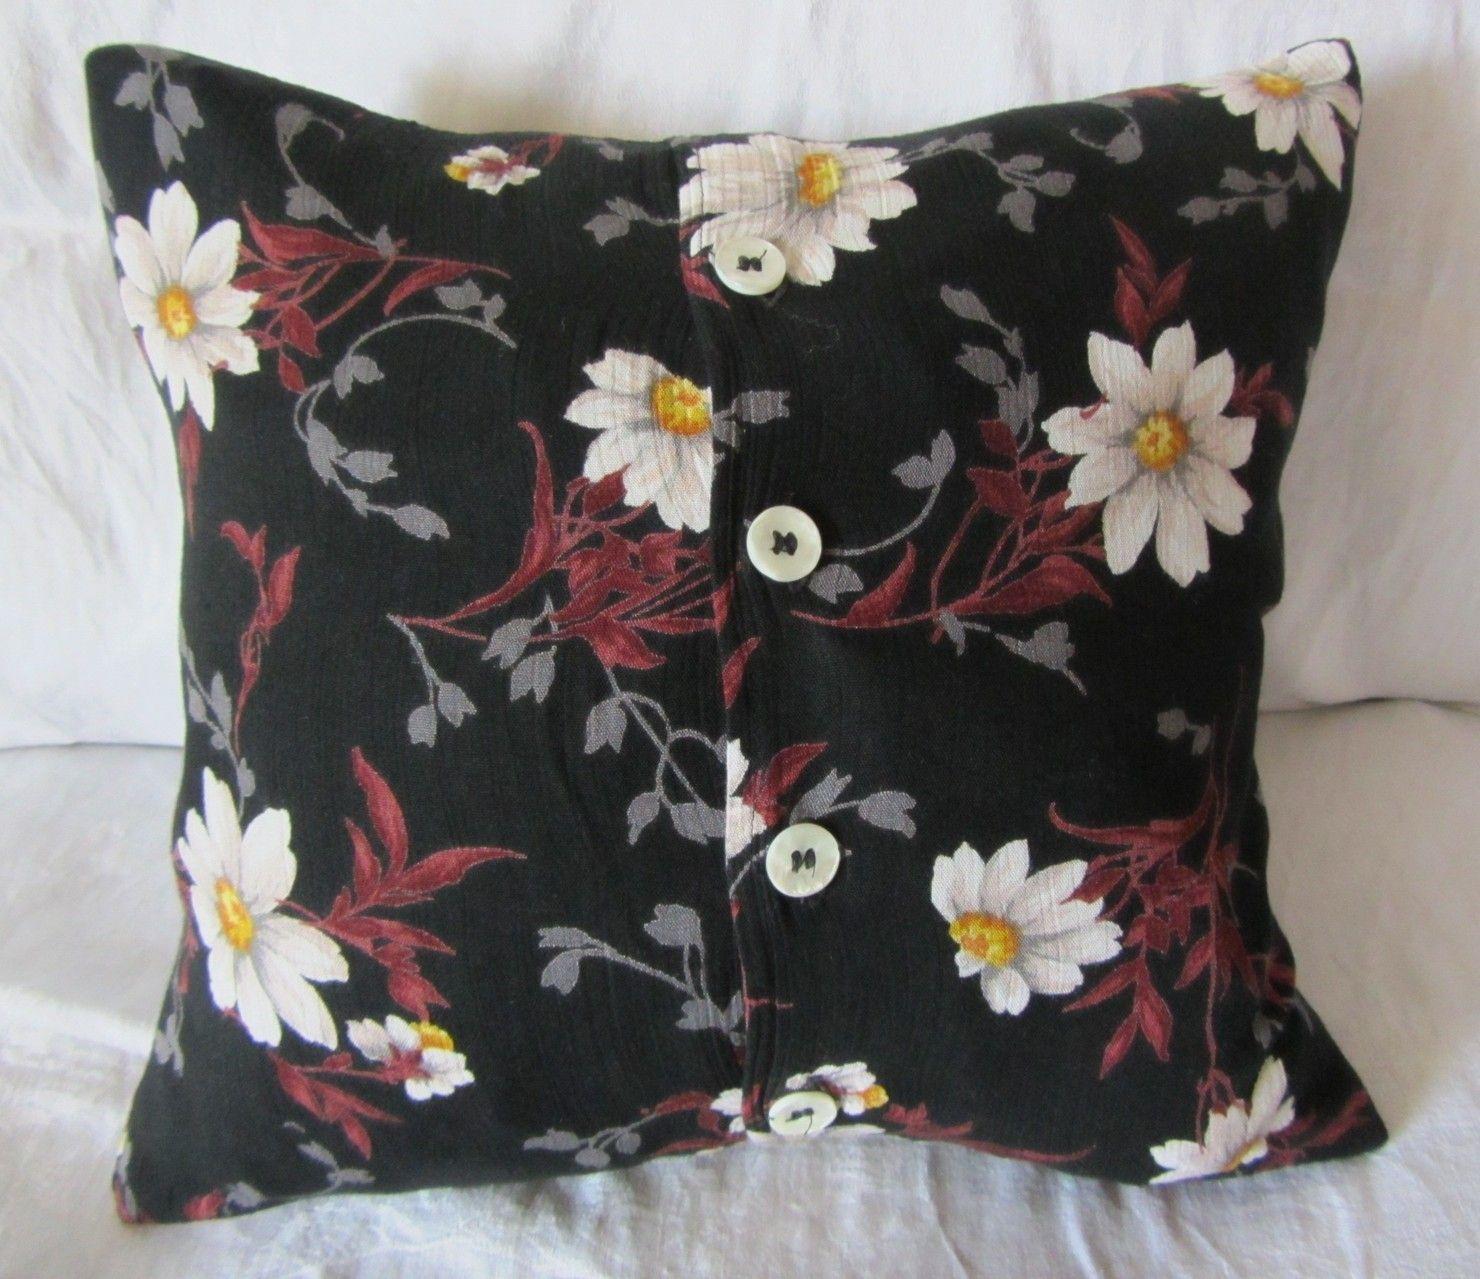 Upcycled skirt ue black sofa cushion with flowers lauthmou 오피스